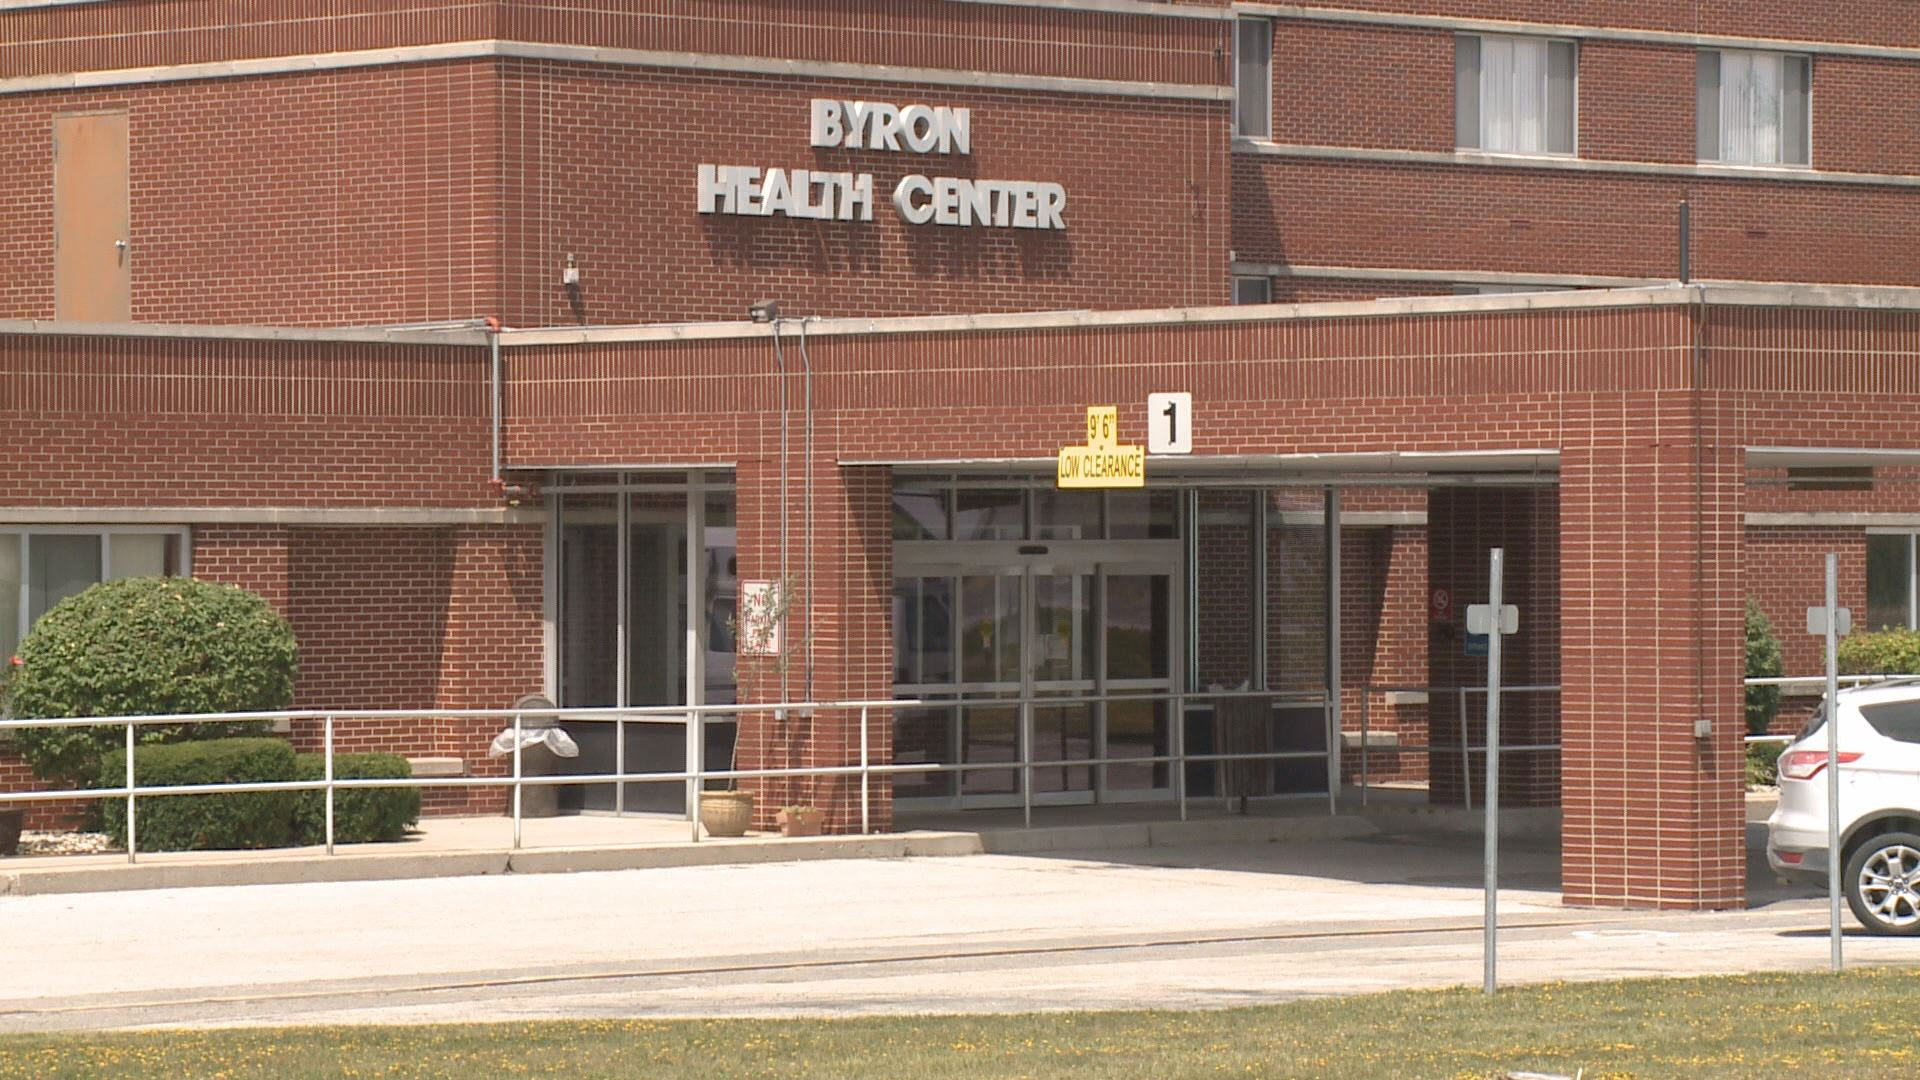 byron-health-center_239700